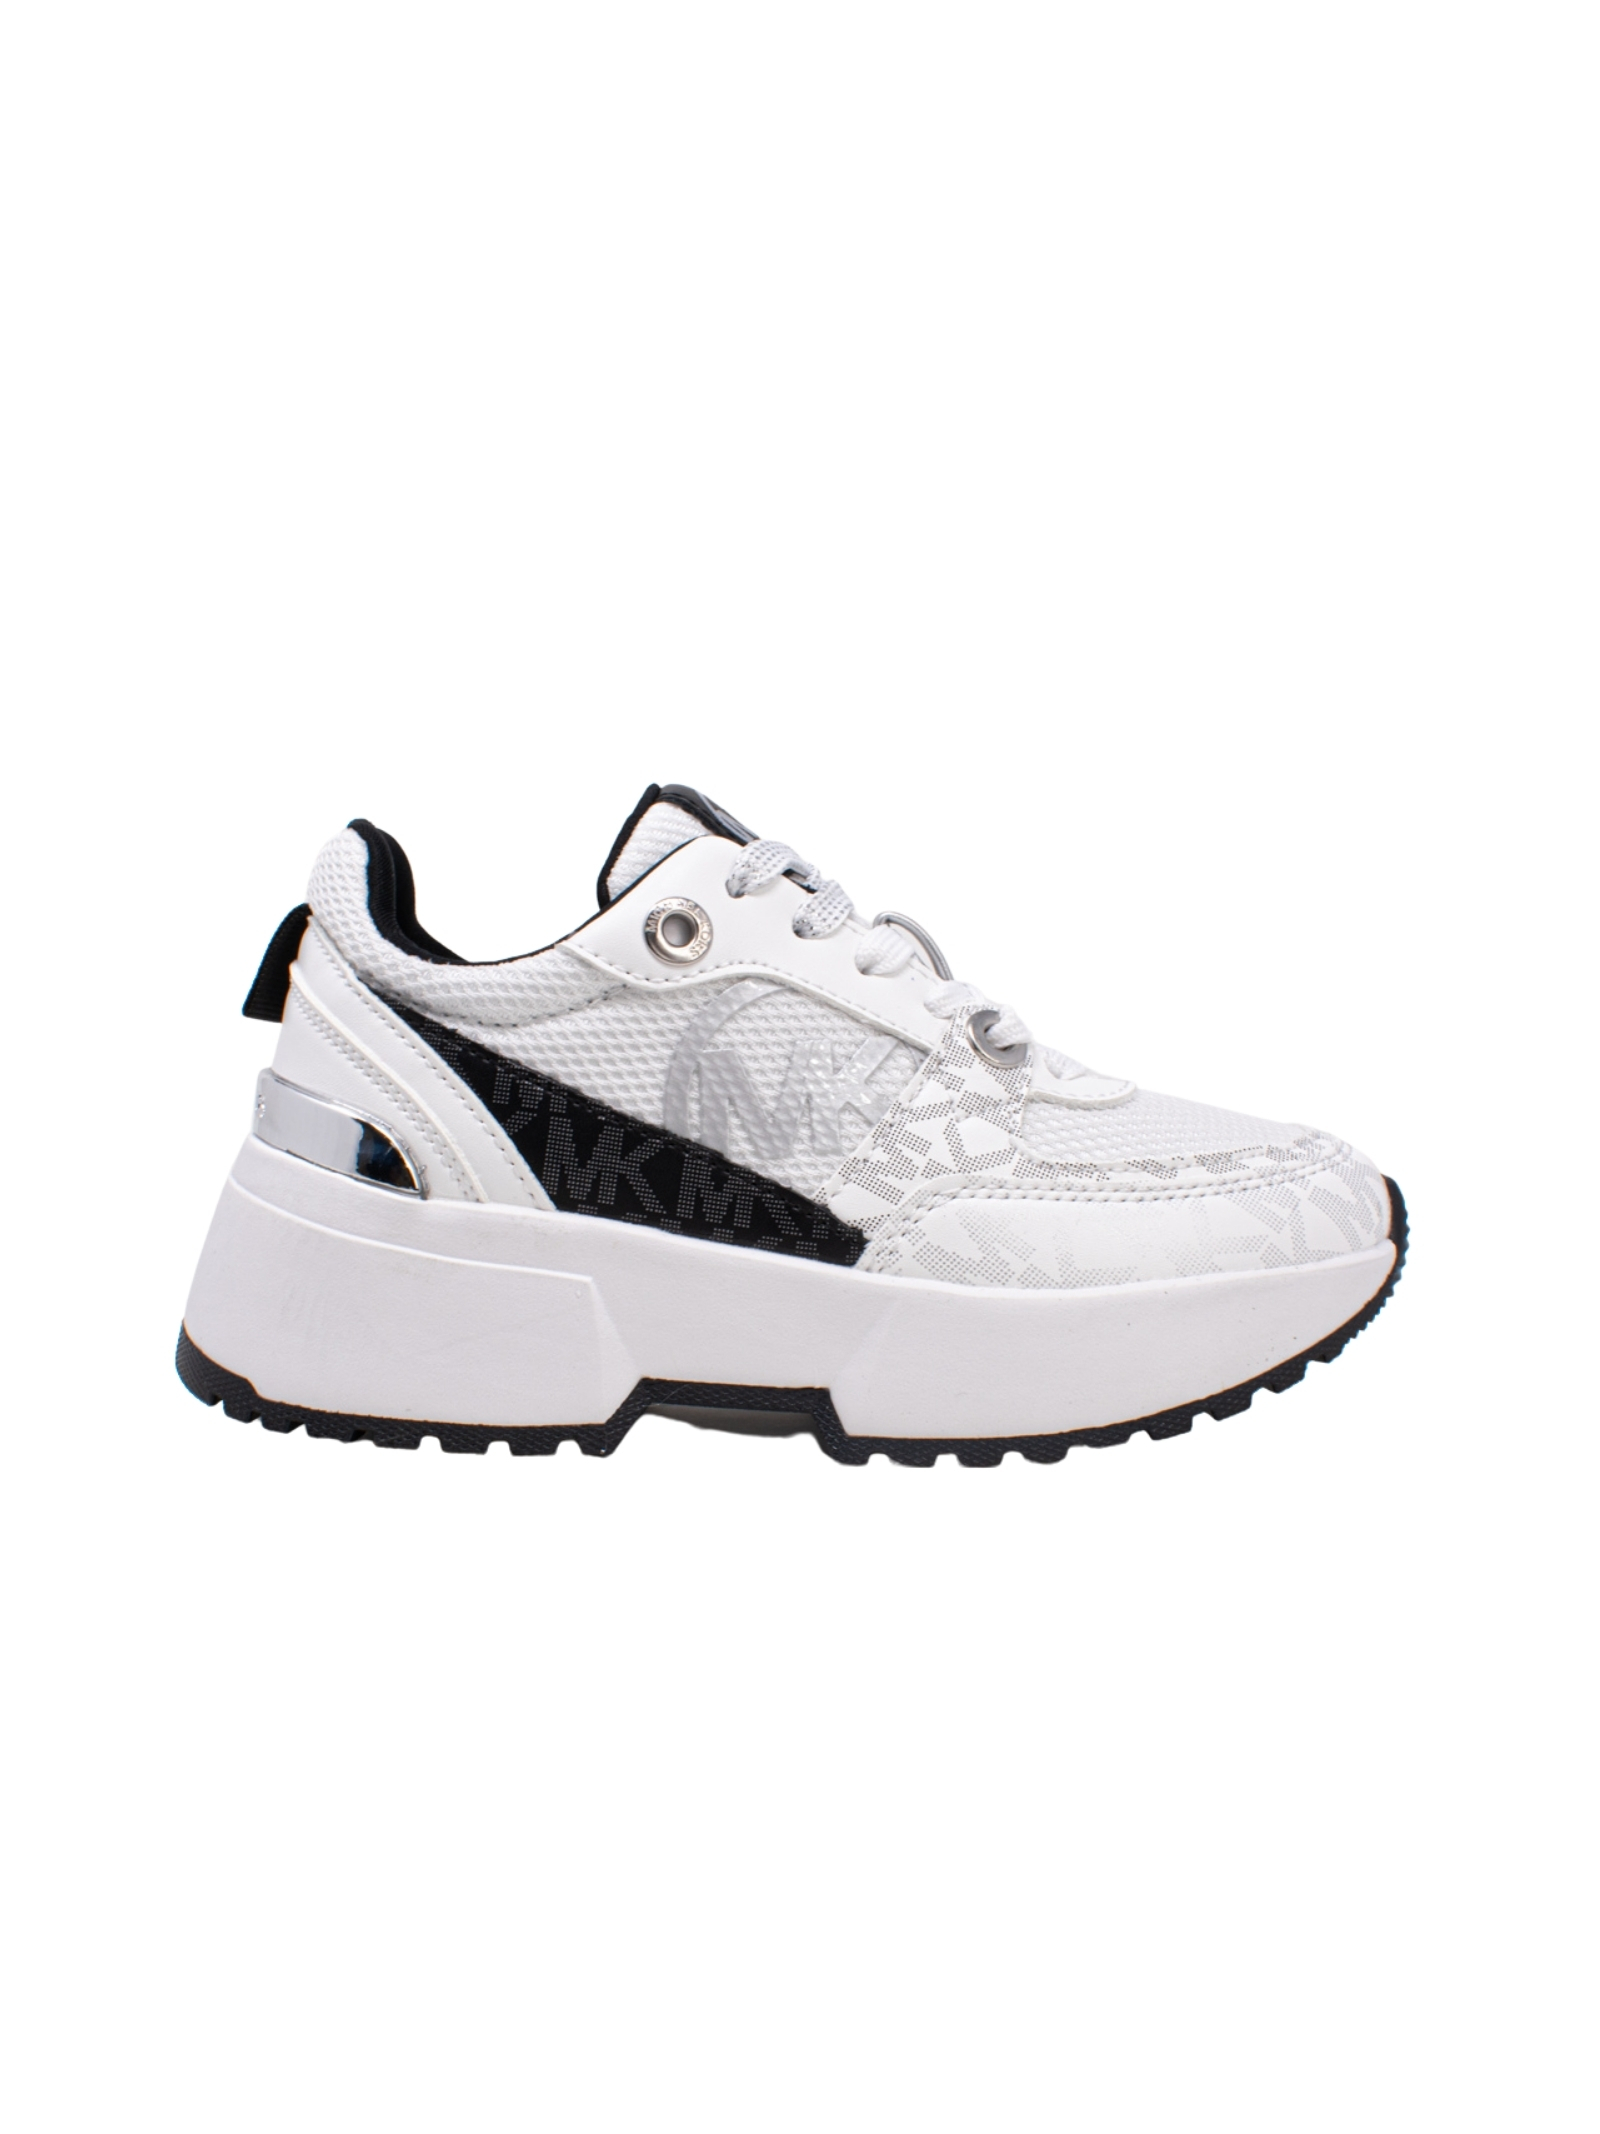 MICHAEL KORS JUNIOR | Sneakers | MK100002CBIANCO